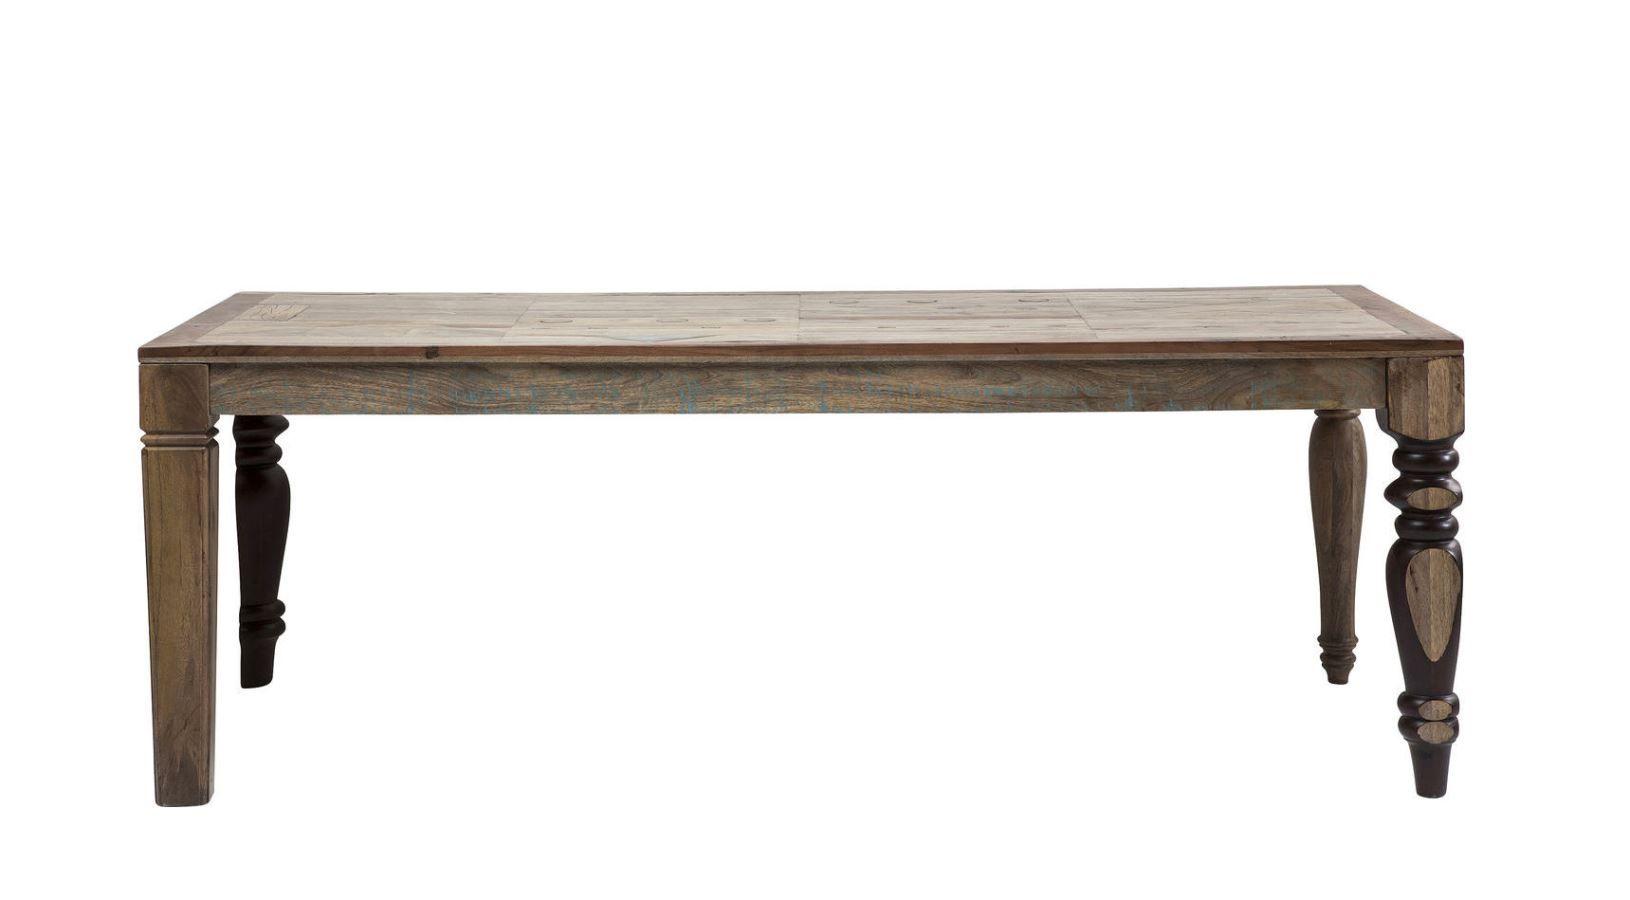 KARE Tisch Duld Range Vintage Antik 220x100cm